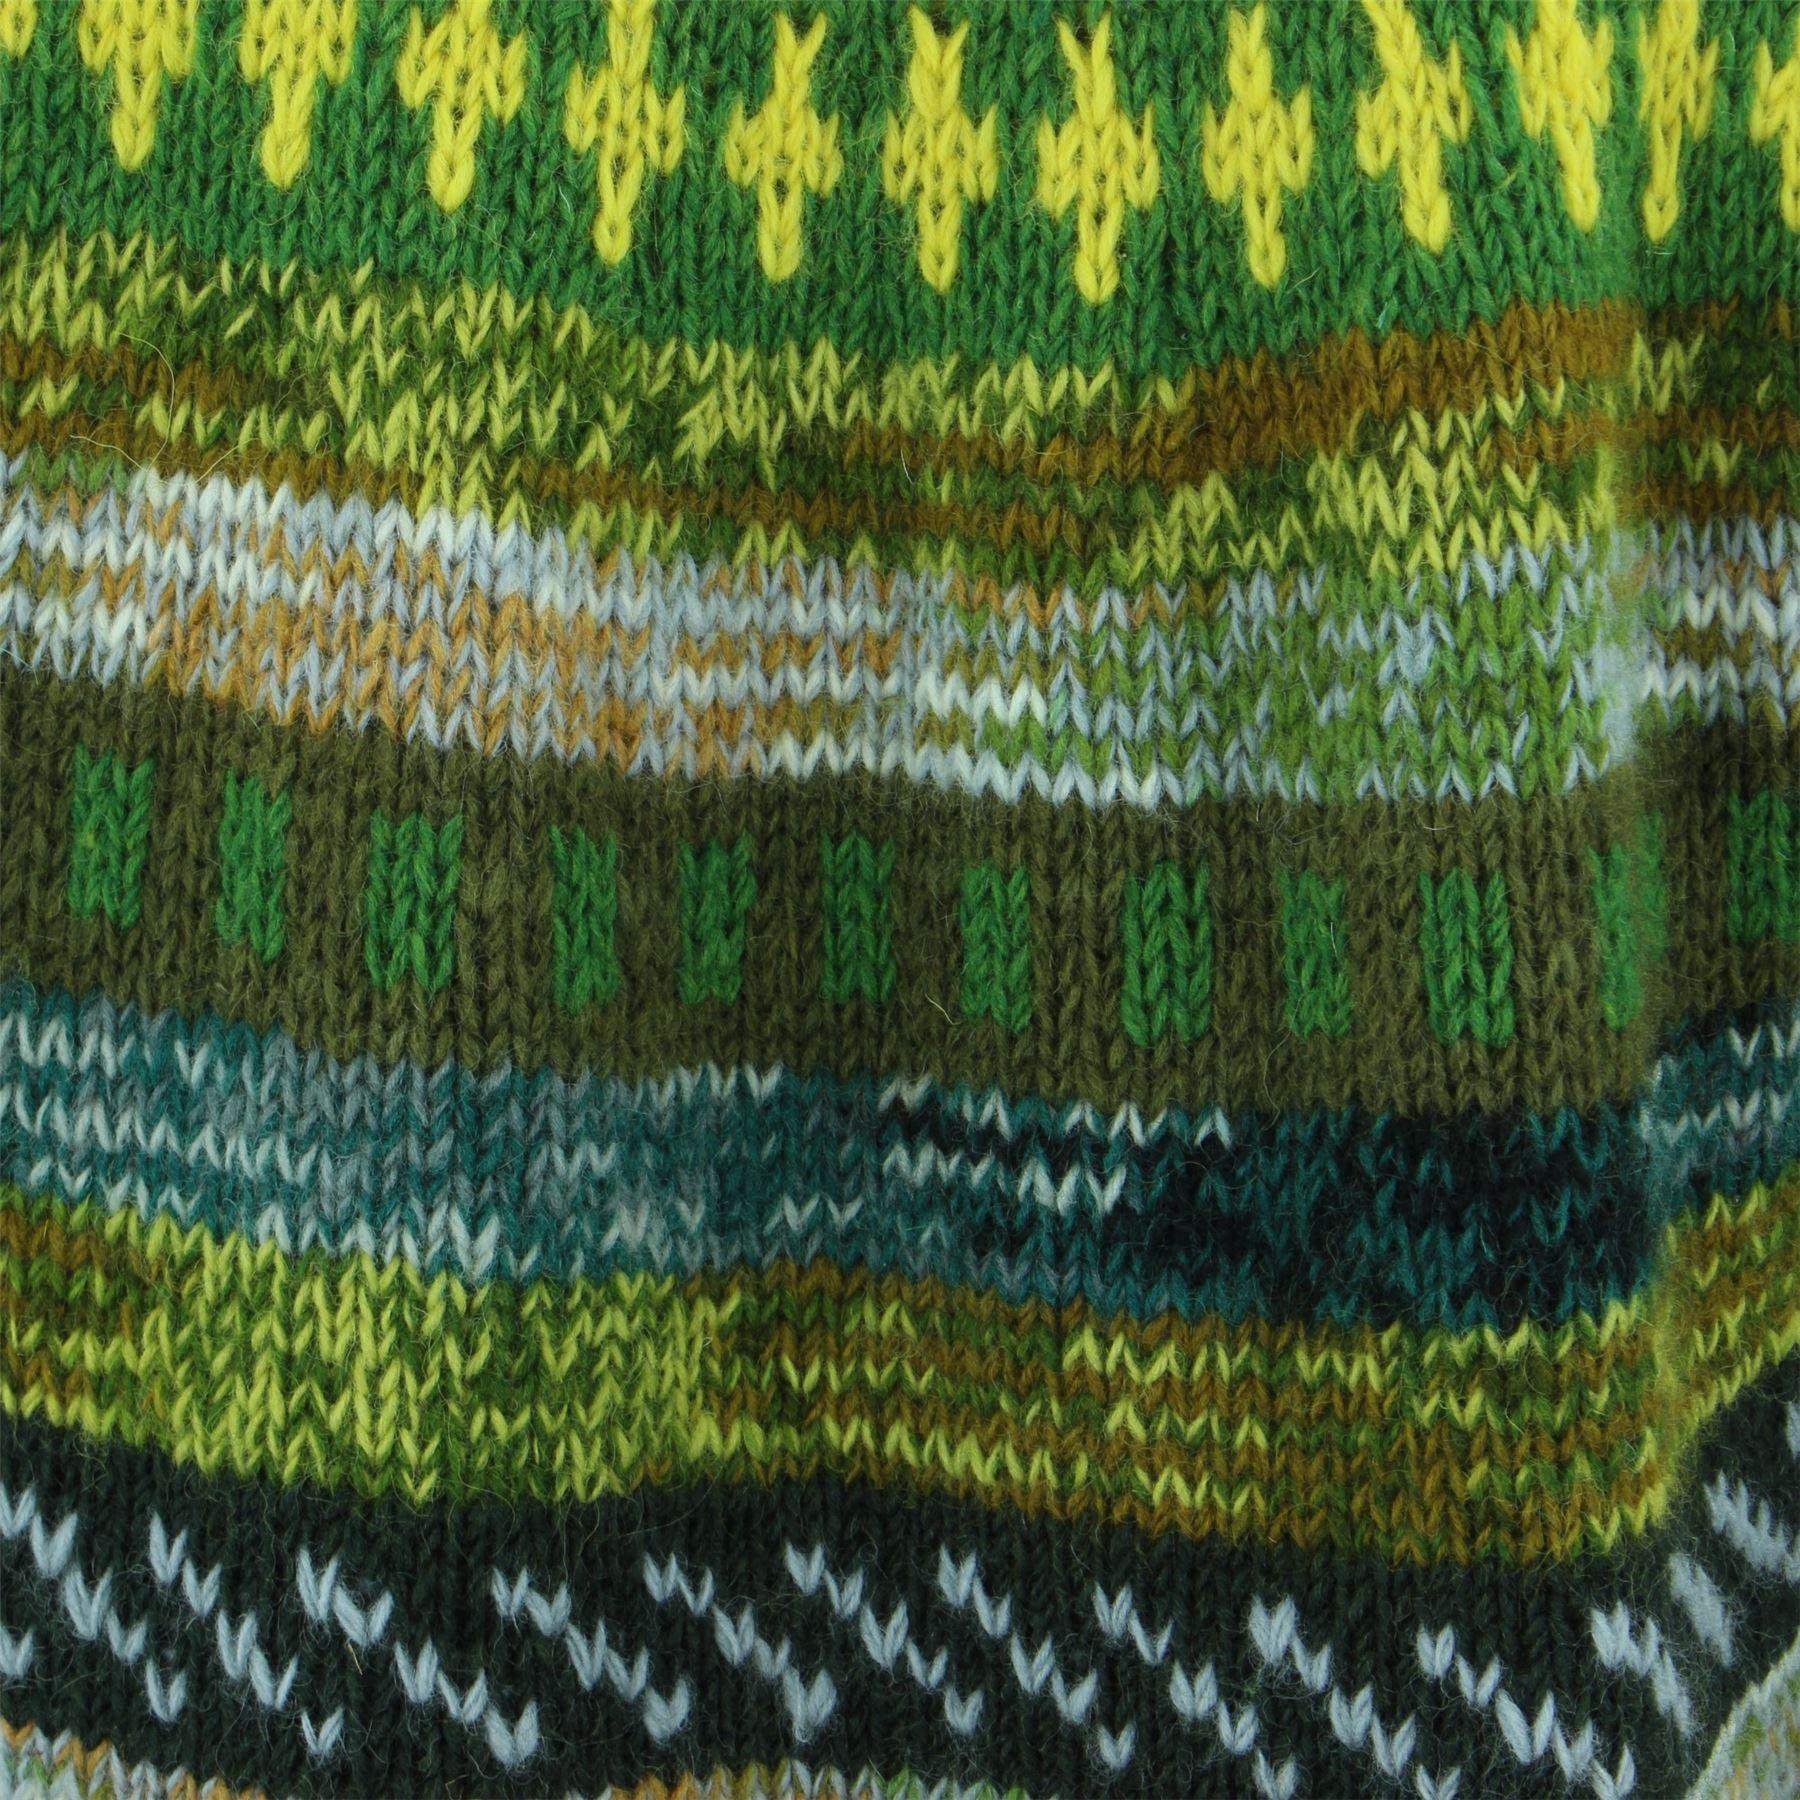 thumbnail 11 - Wool Knit Jumper Sweater Pullover Fairisle Nordic Abstract Warm Nepal Loose